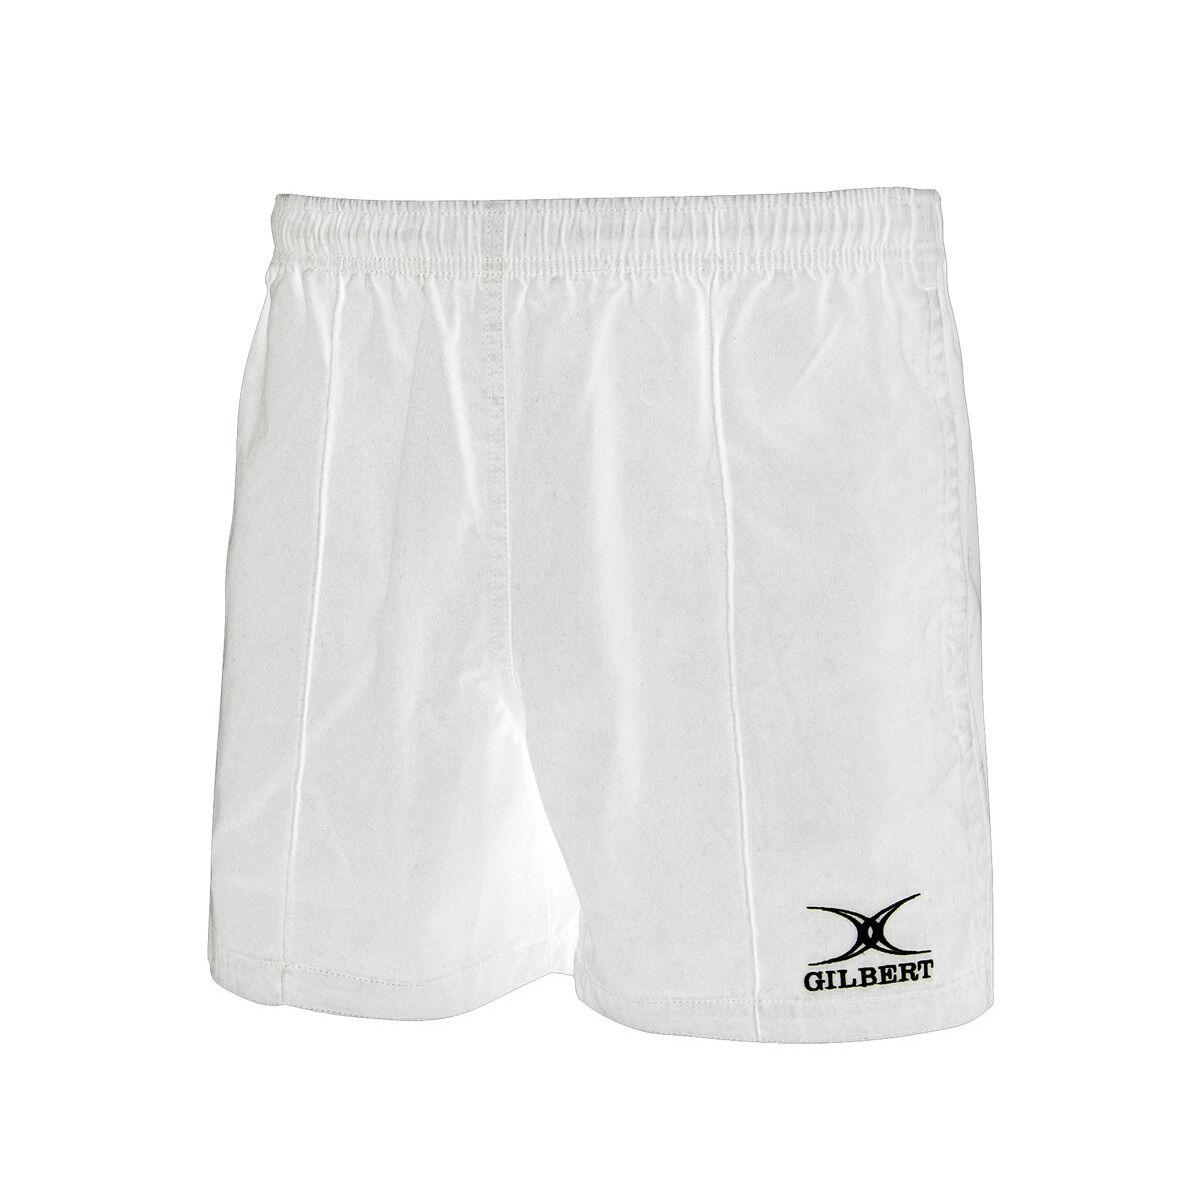 Gilbert Kiwi Pro Shorts (White)